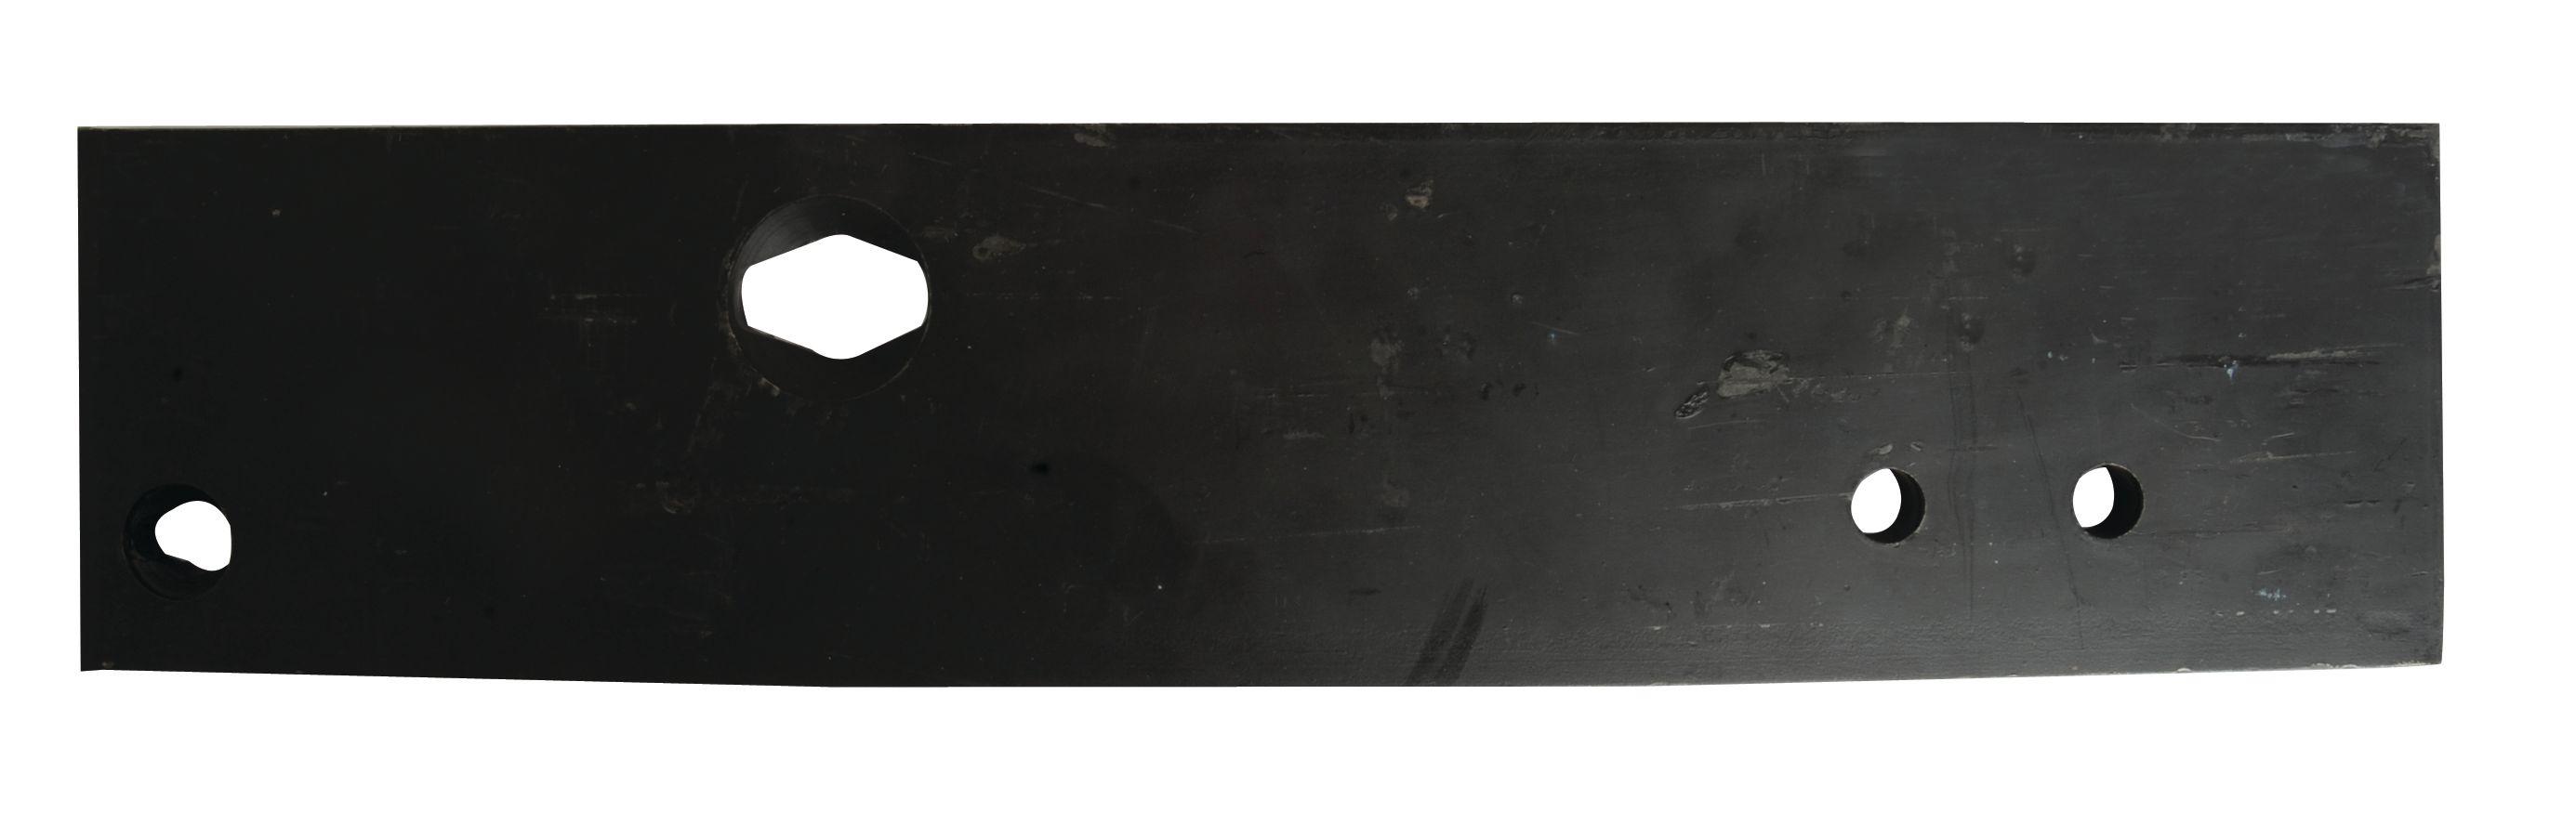 OVERUM LANDSIDE-FISKARS FRONT RH 77427